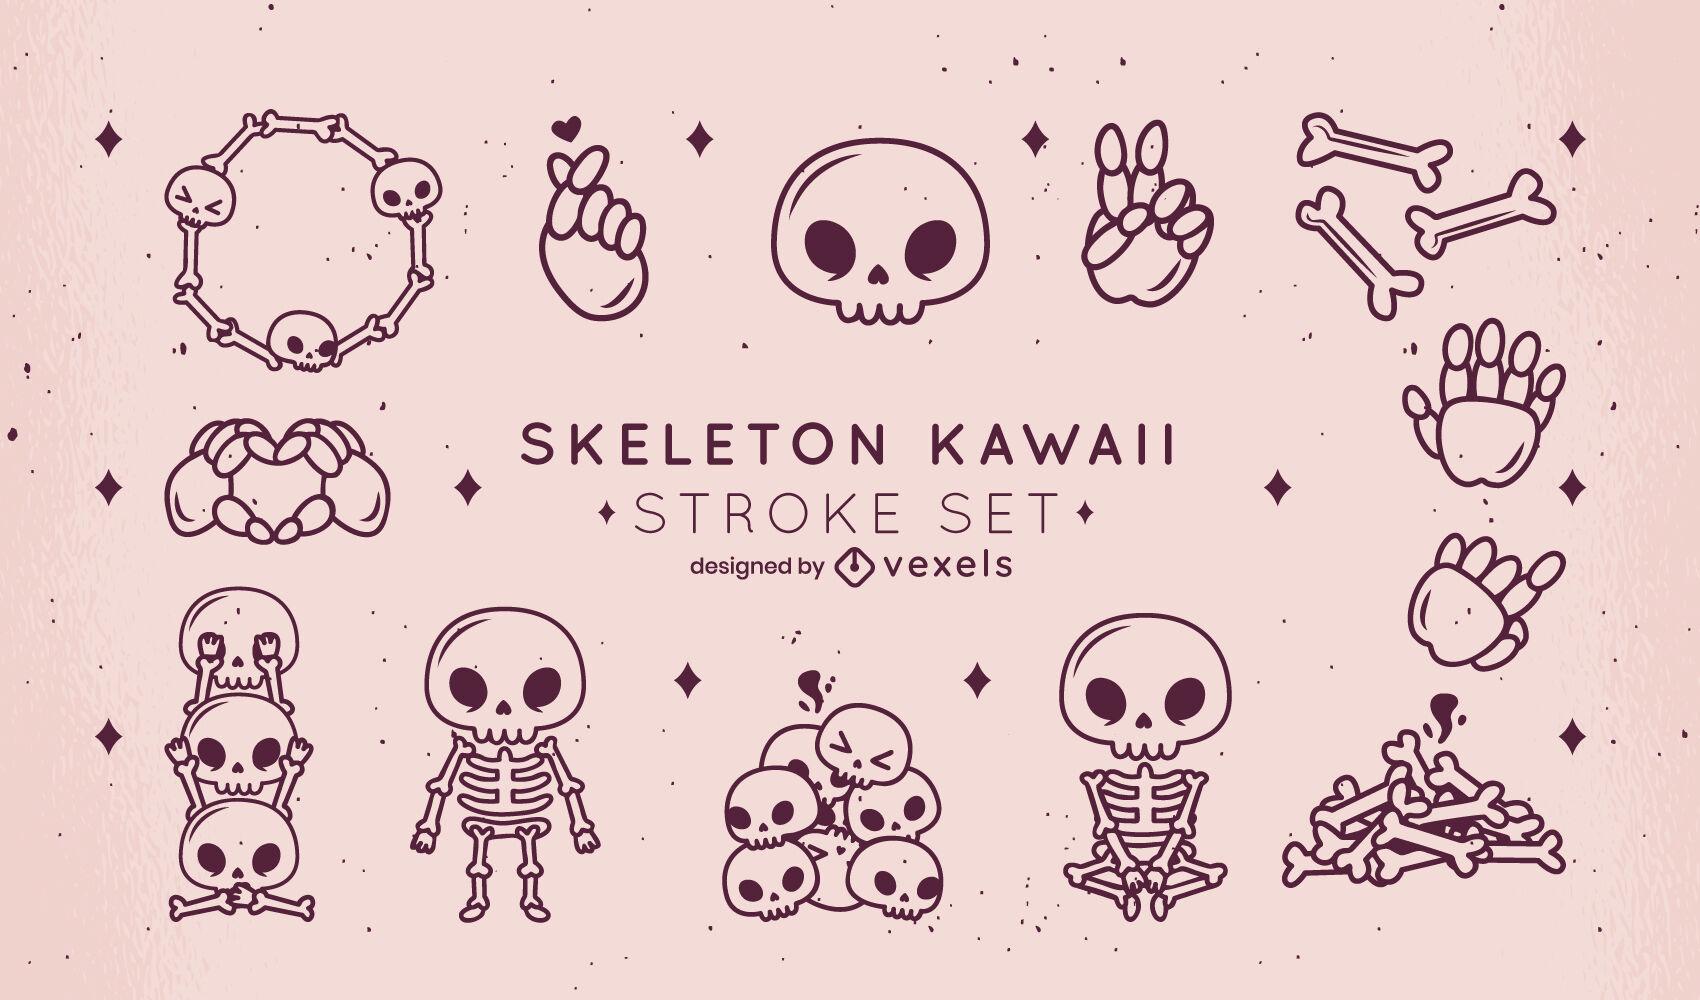 Skeleton and skulls kawaii stroke set